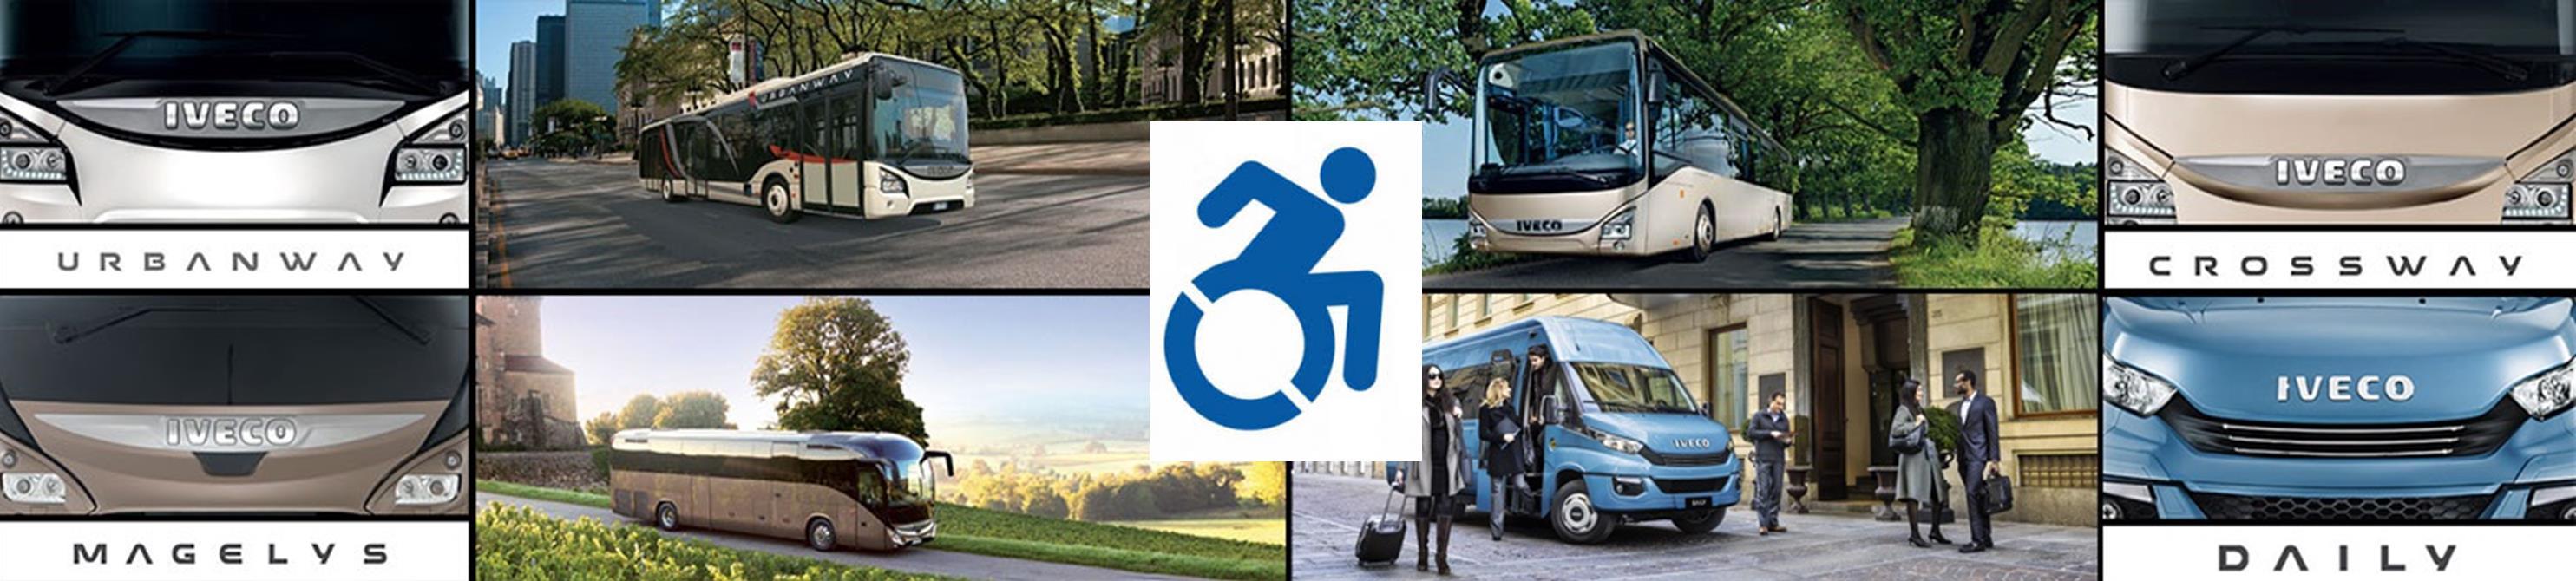 Concessionaria Orecchia Iveco bus